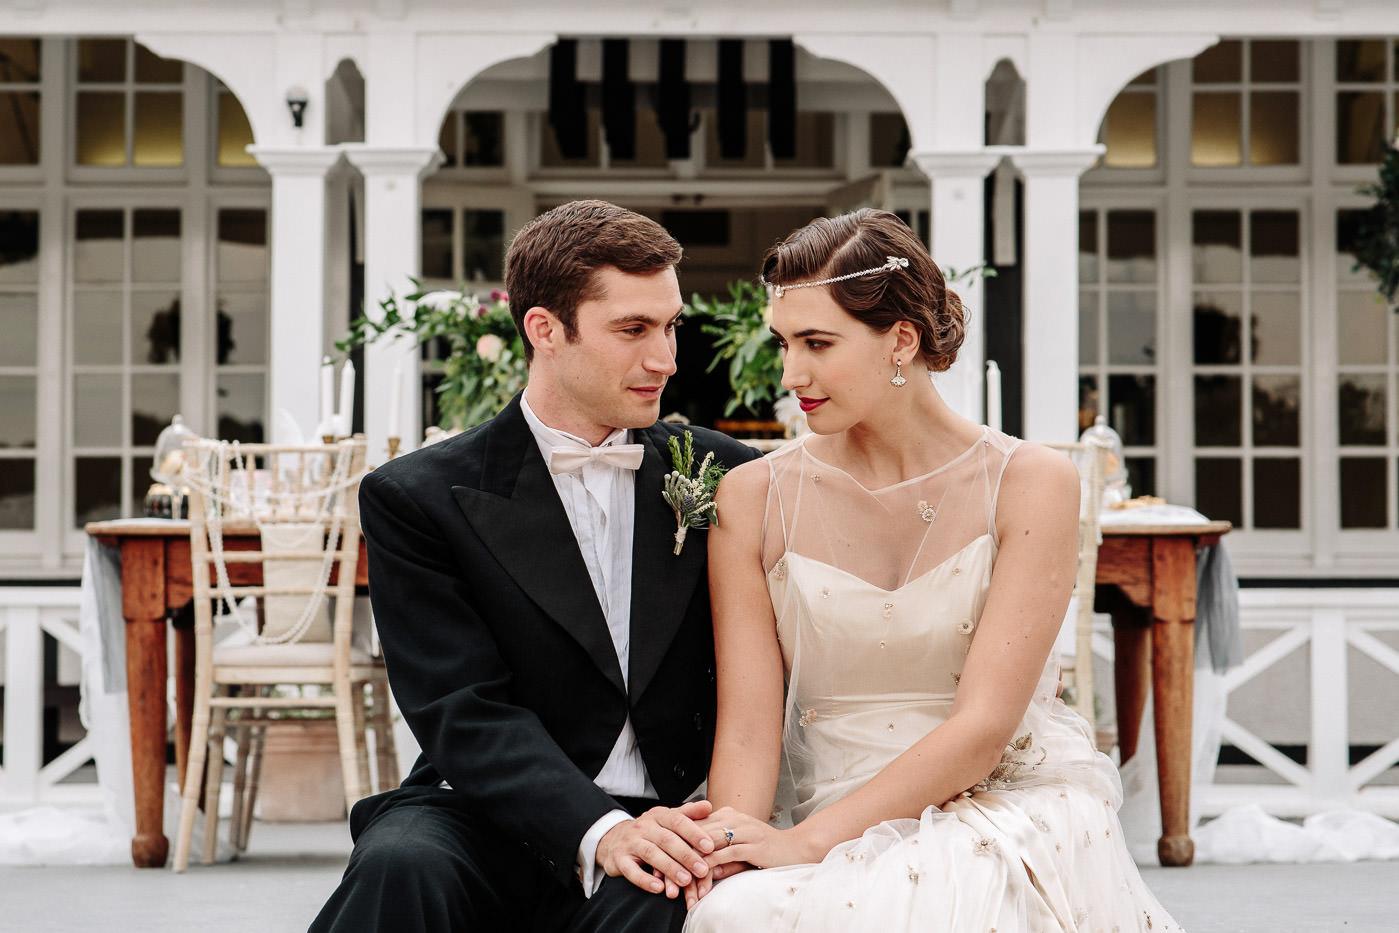 wedding-photographer-hertfordshire-98.jpg